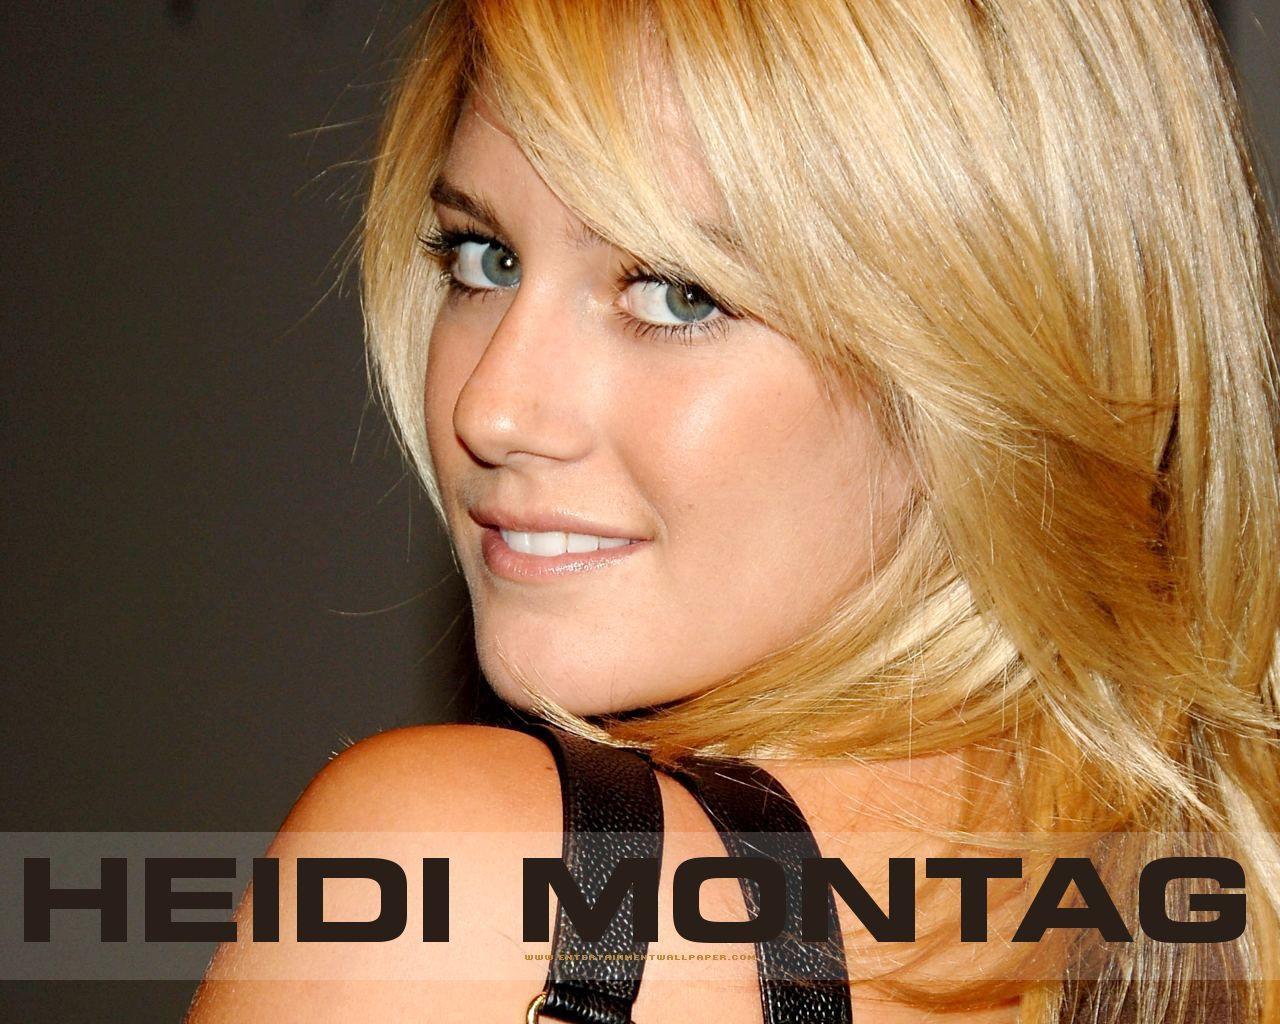 Heidi_2